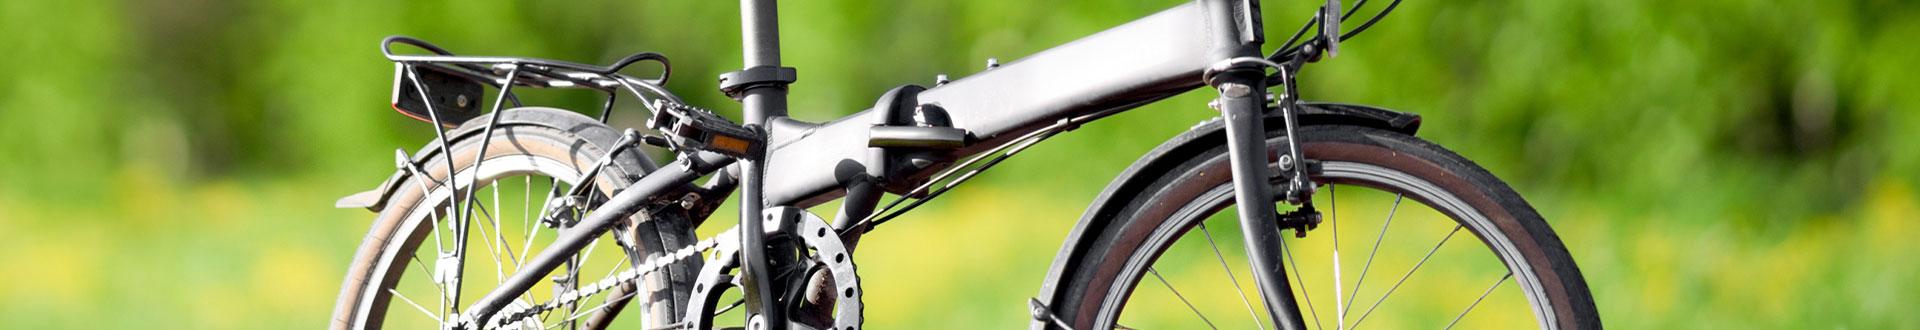 Folding bikes - Sport Globe